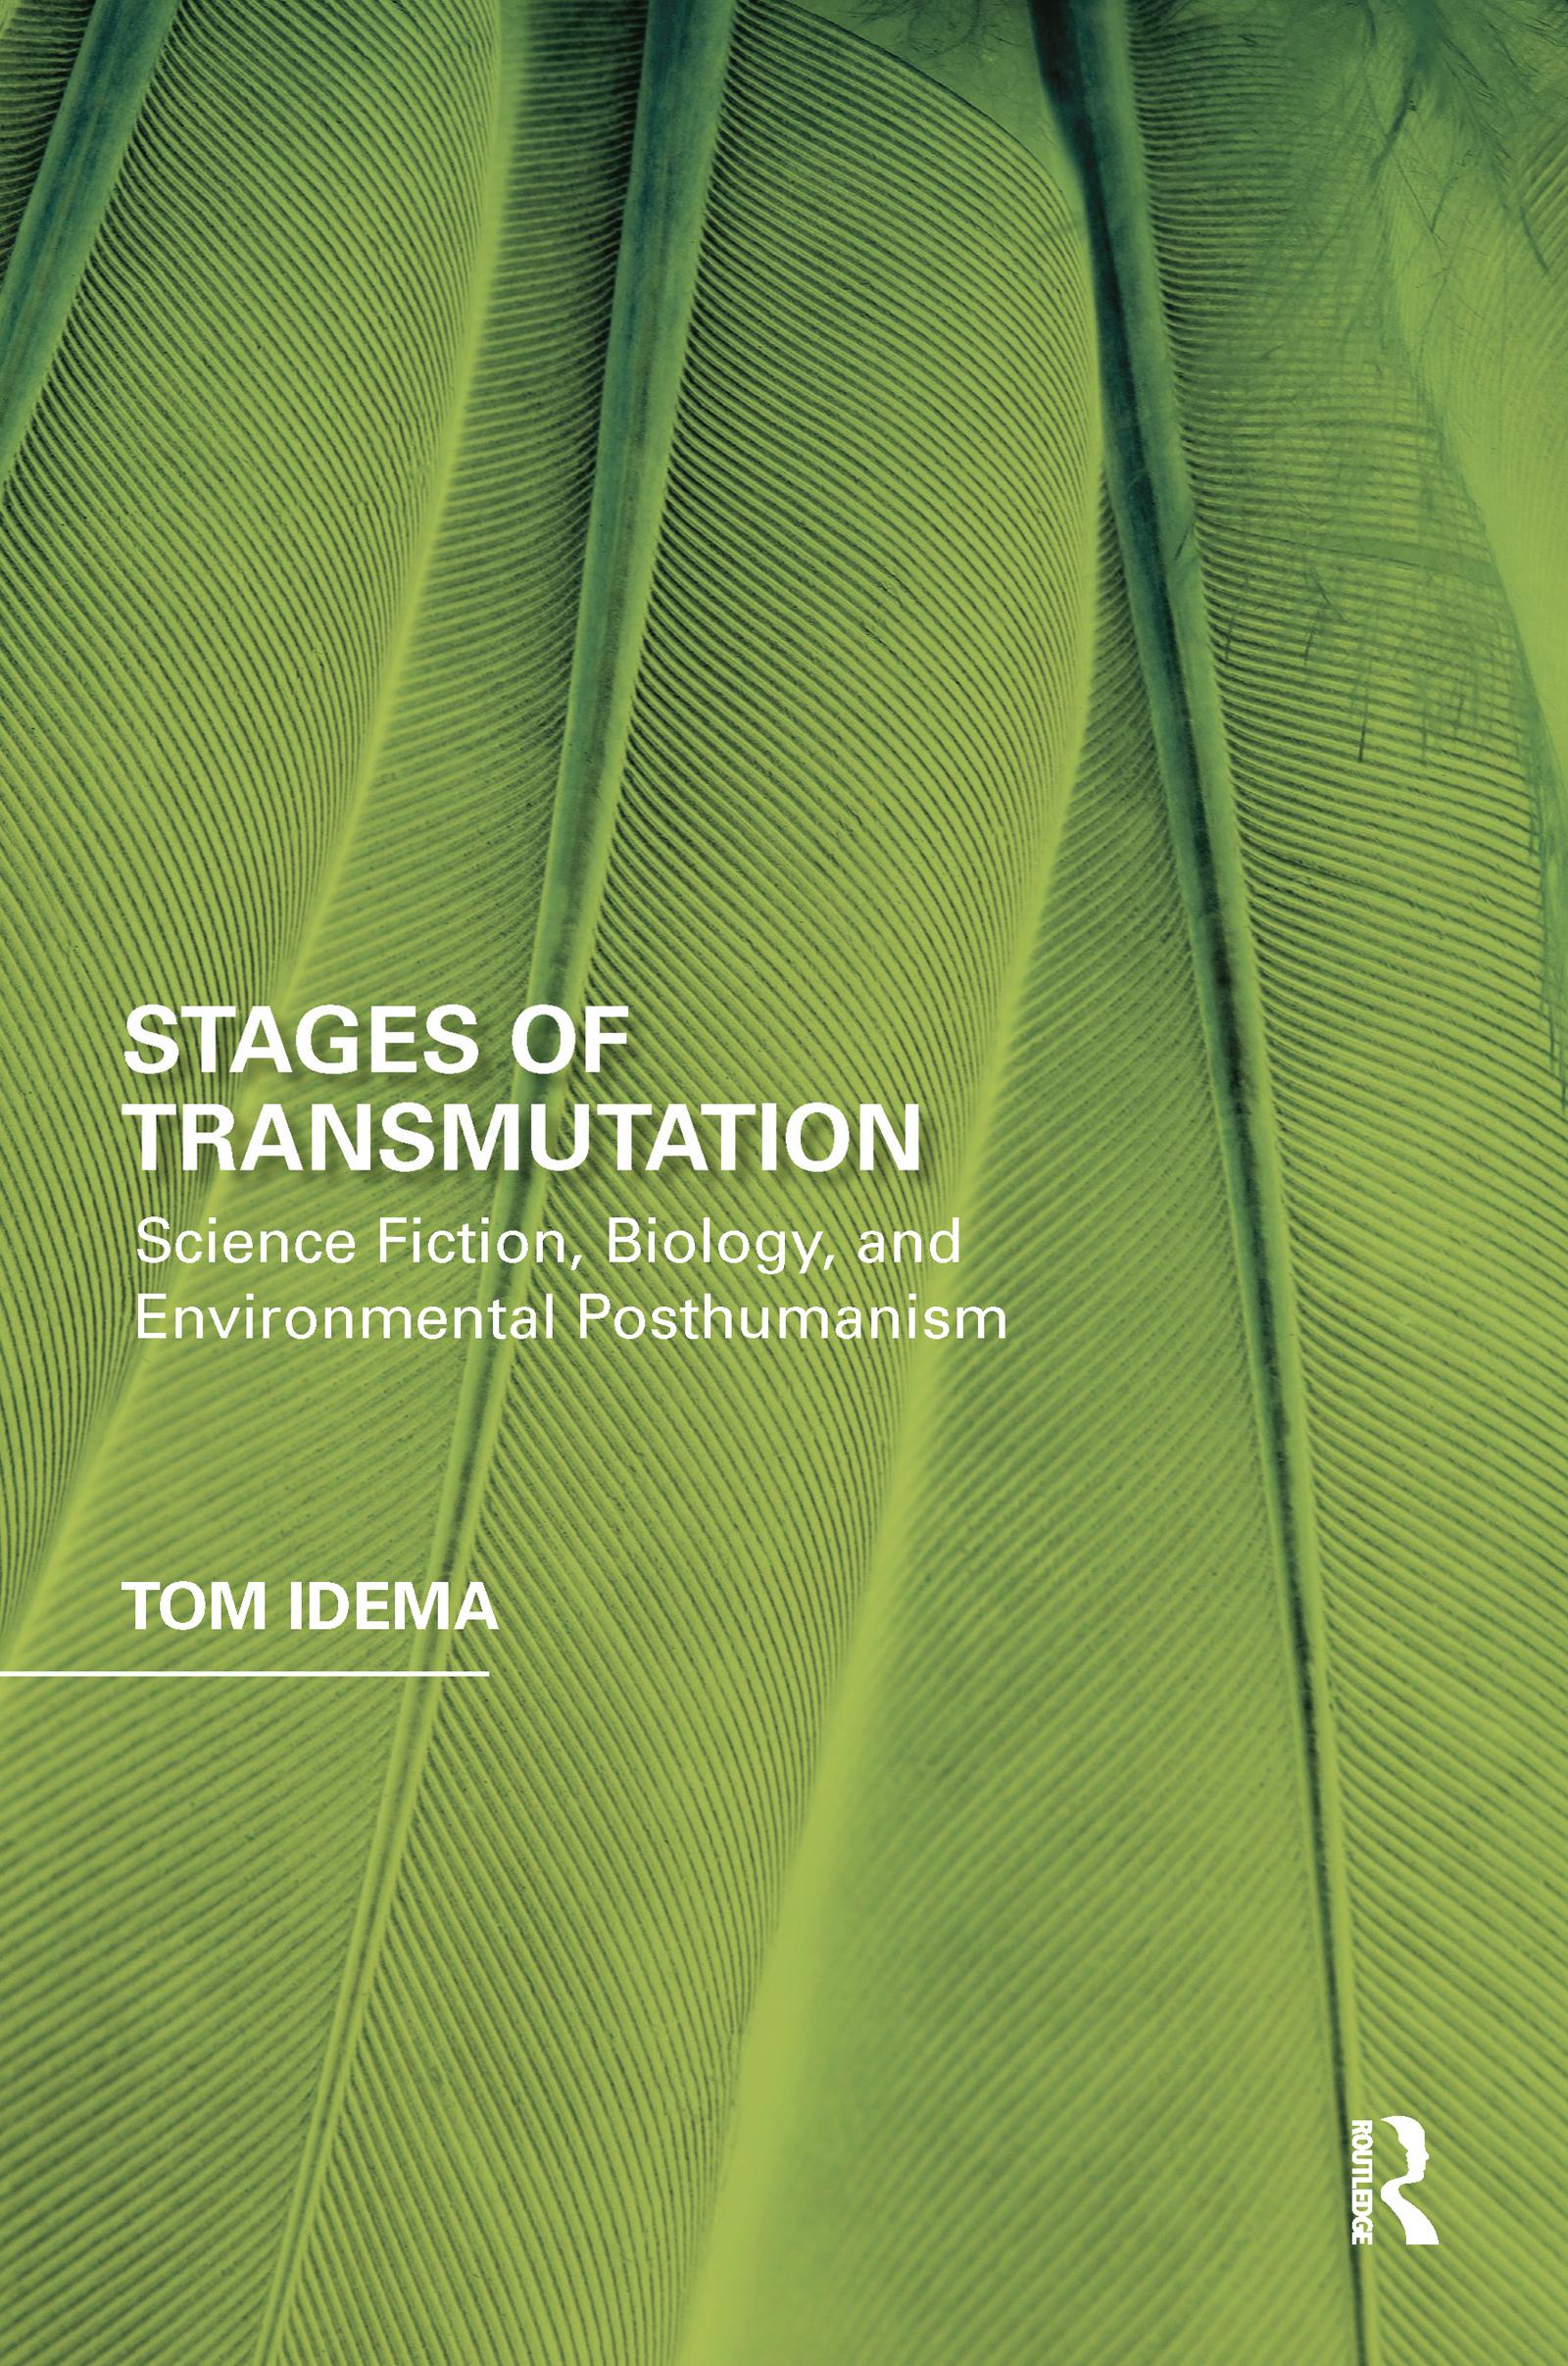 Stages of Transmutation